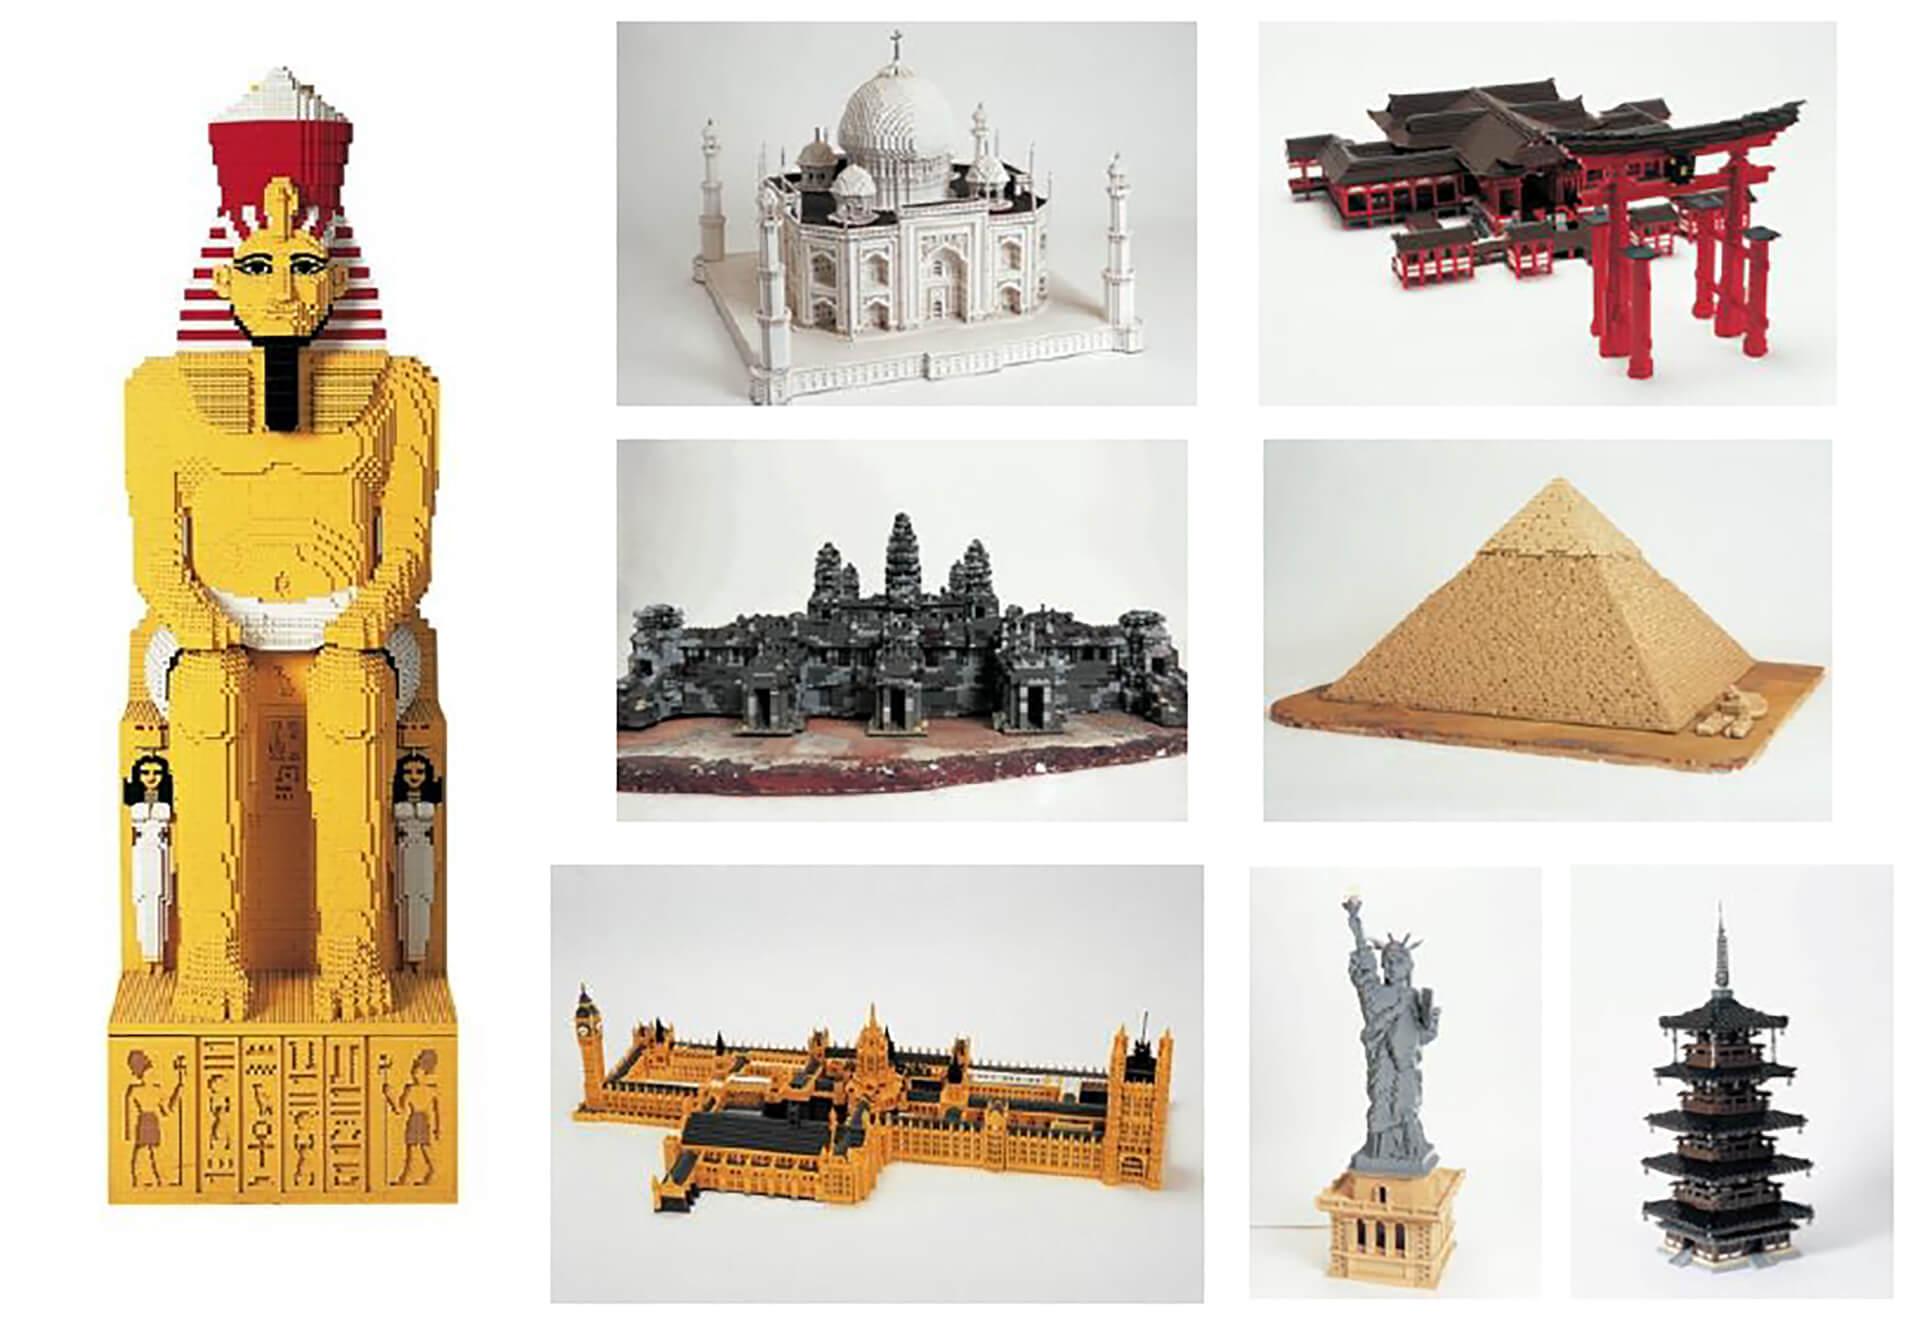 PIECE OF PEACE 『レゴ(R)ブロック』で作った世界遺産展 PART-4・展示品